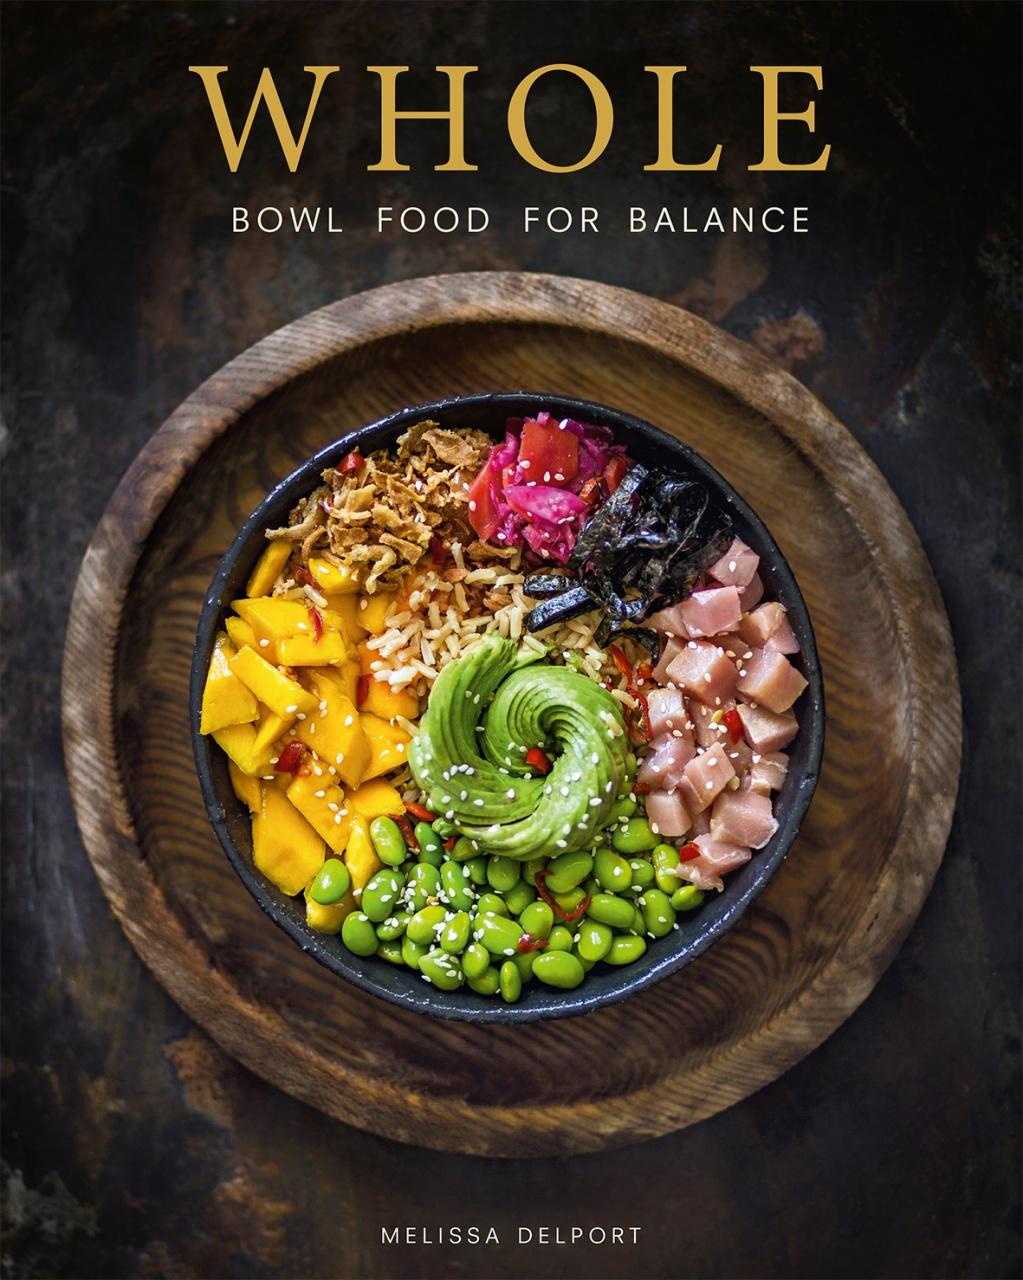 WHOLE - bowl food for balance